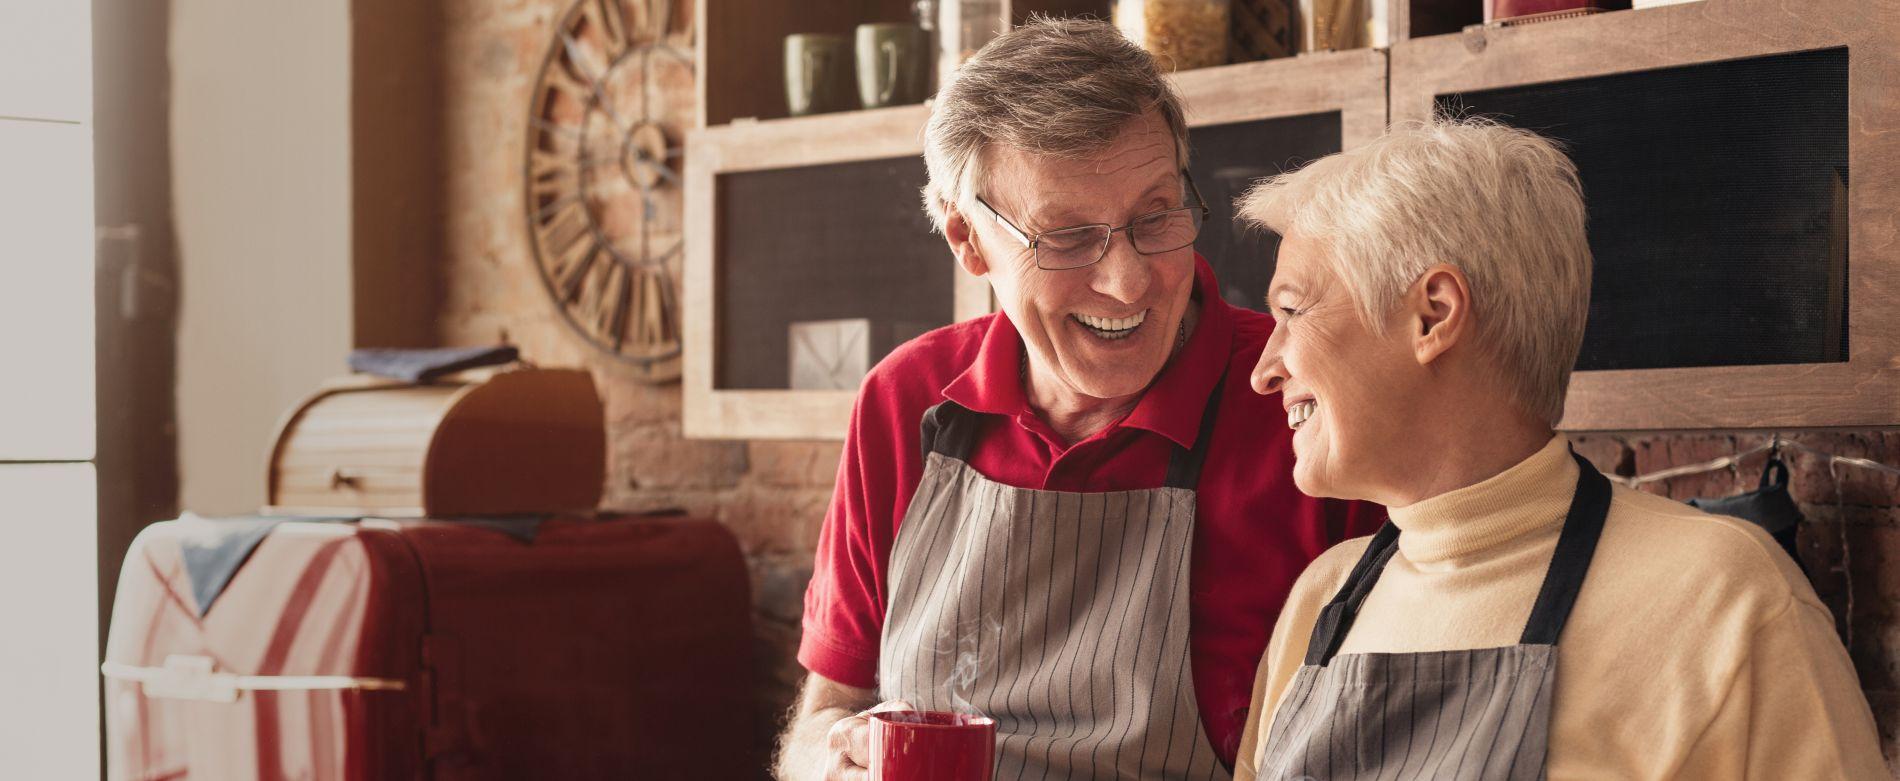 Займ без отказа на карту пенсионерам